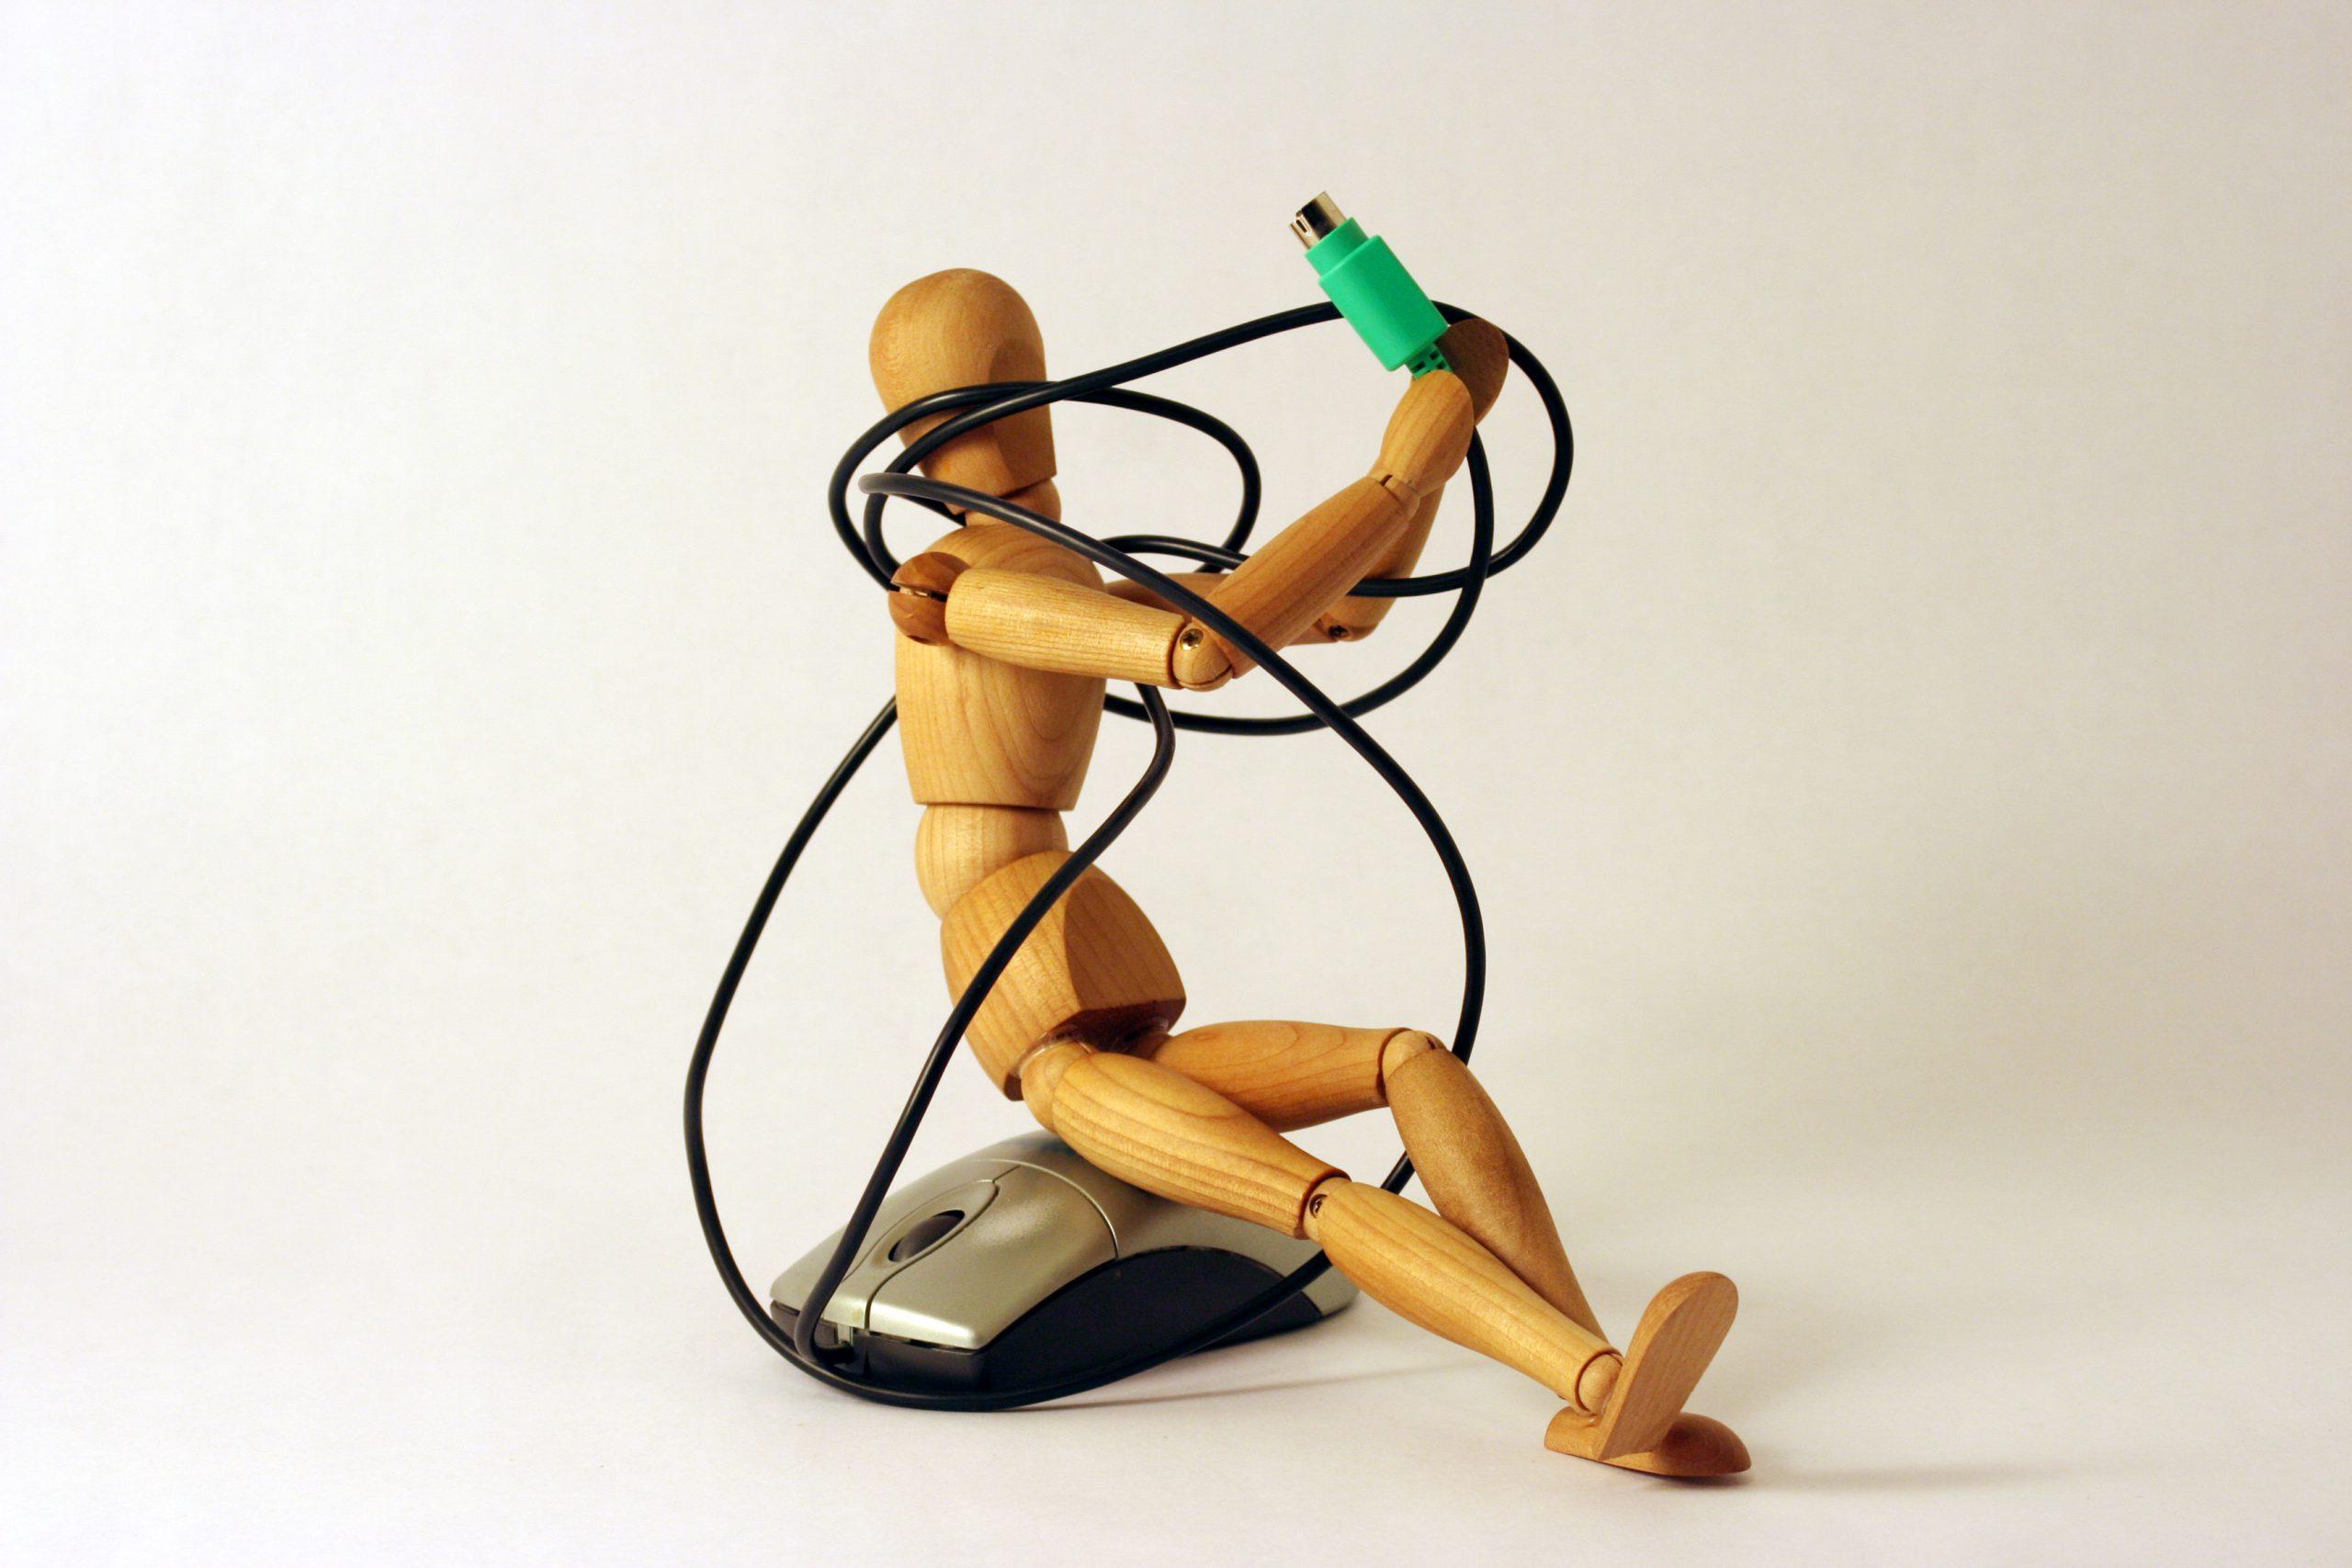 Erp for SME's – Technophobia